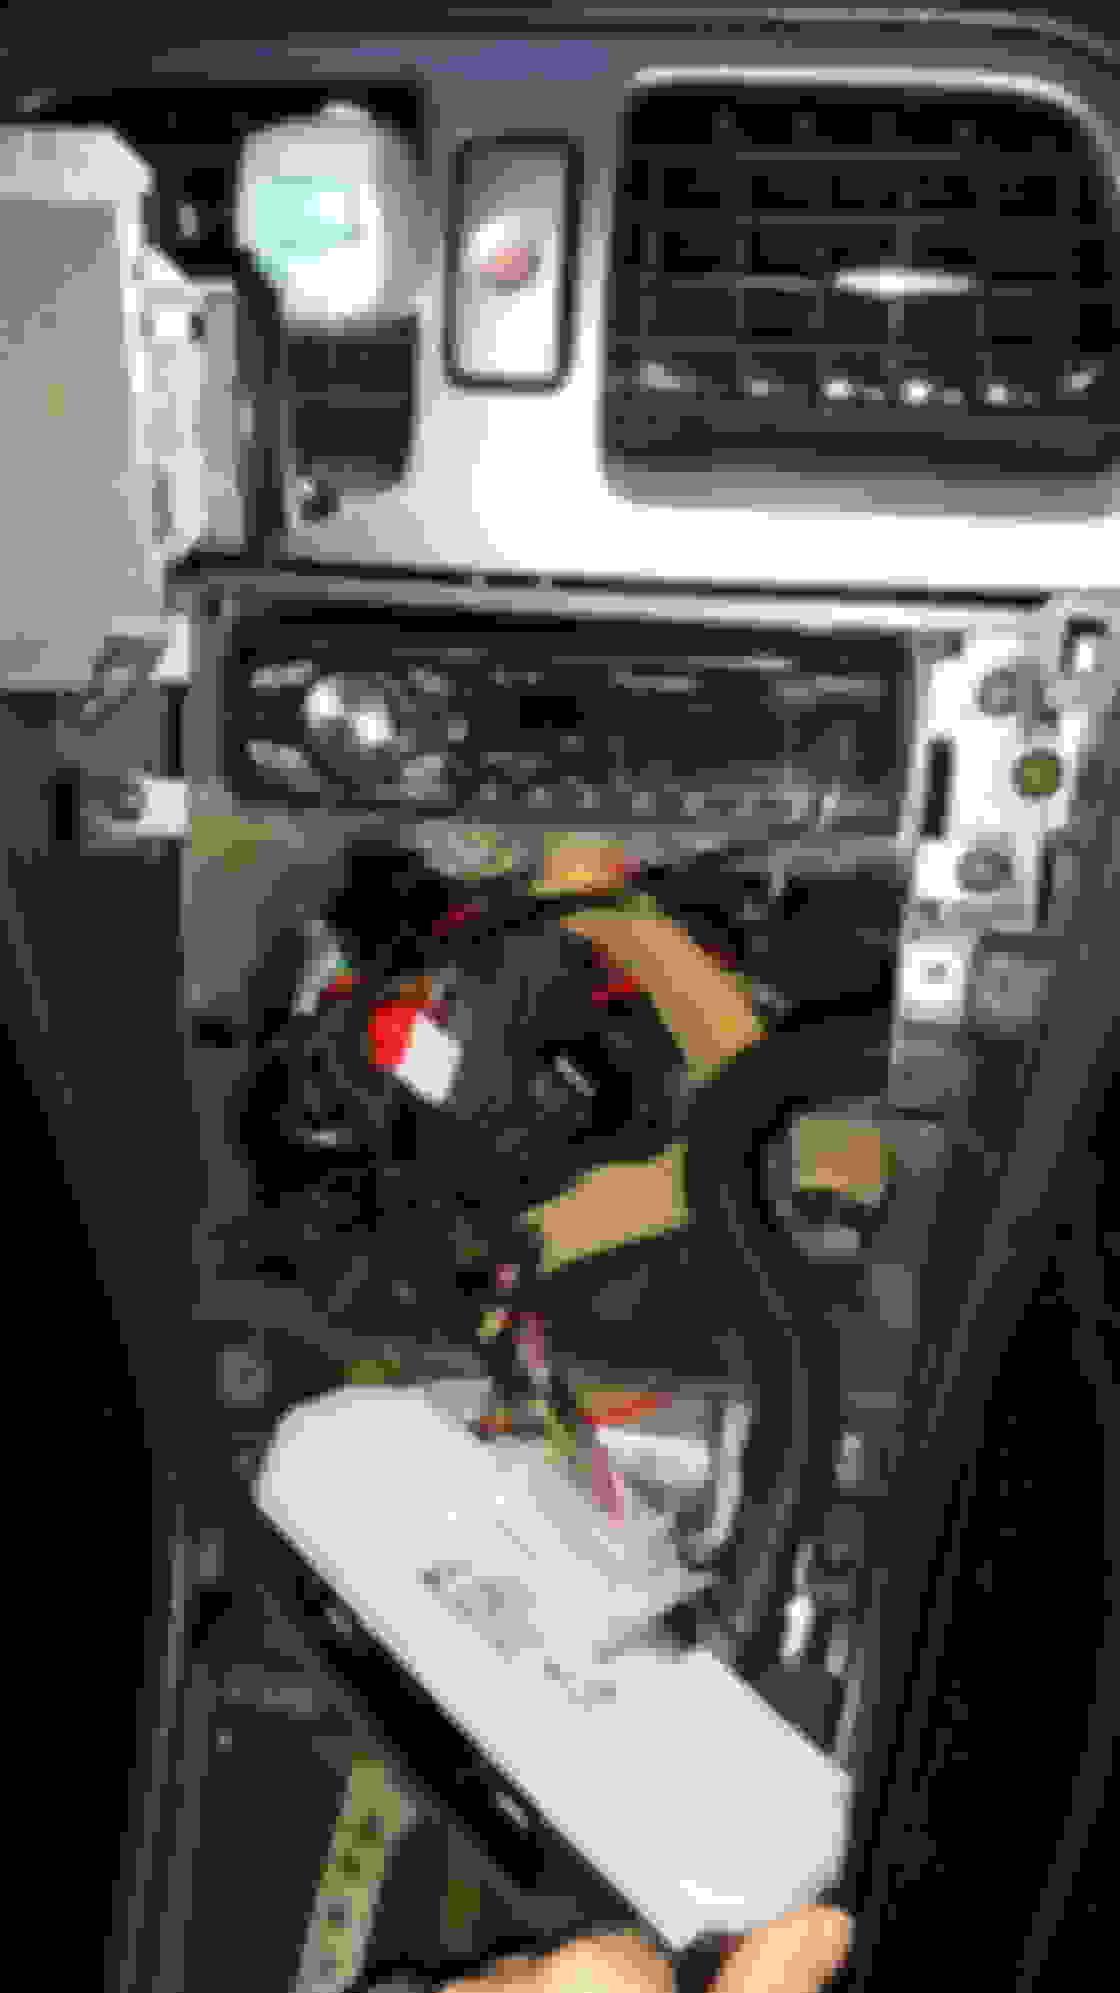 Knock sensor - PicoScope automotive lab scopes and